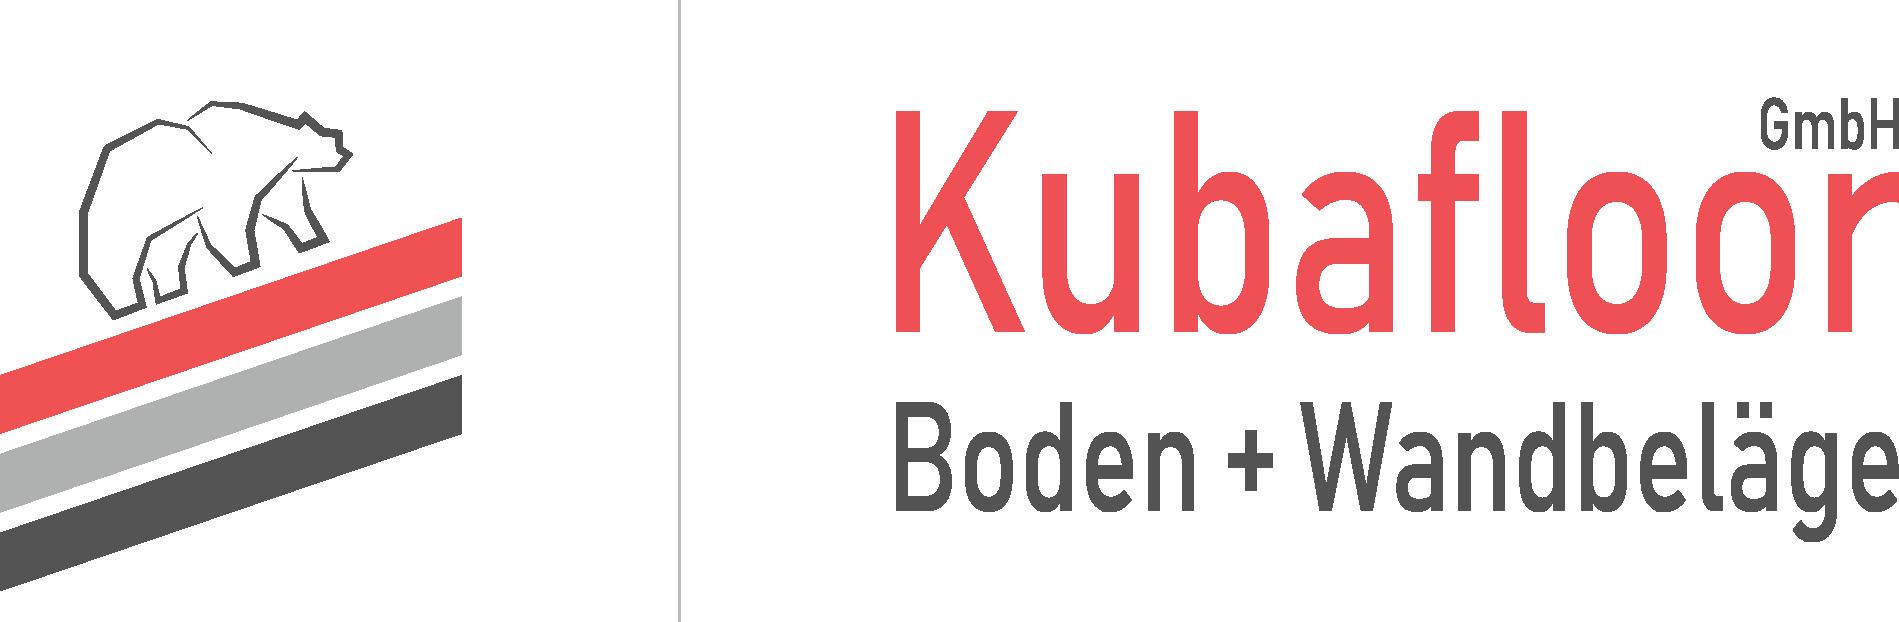 Kubafloor